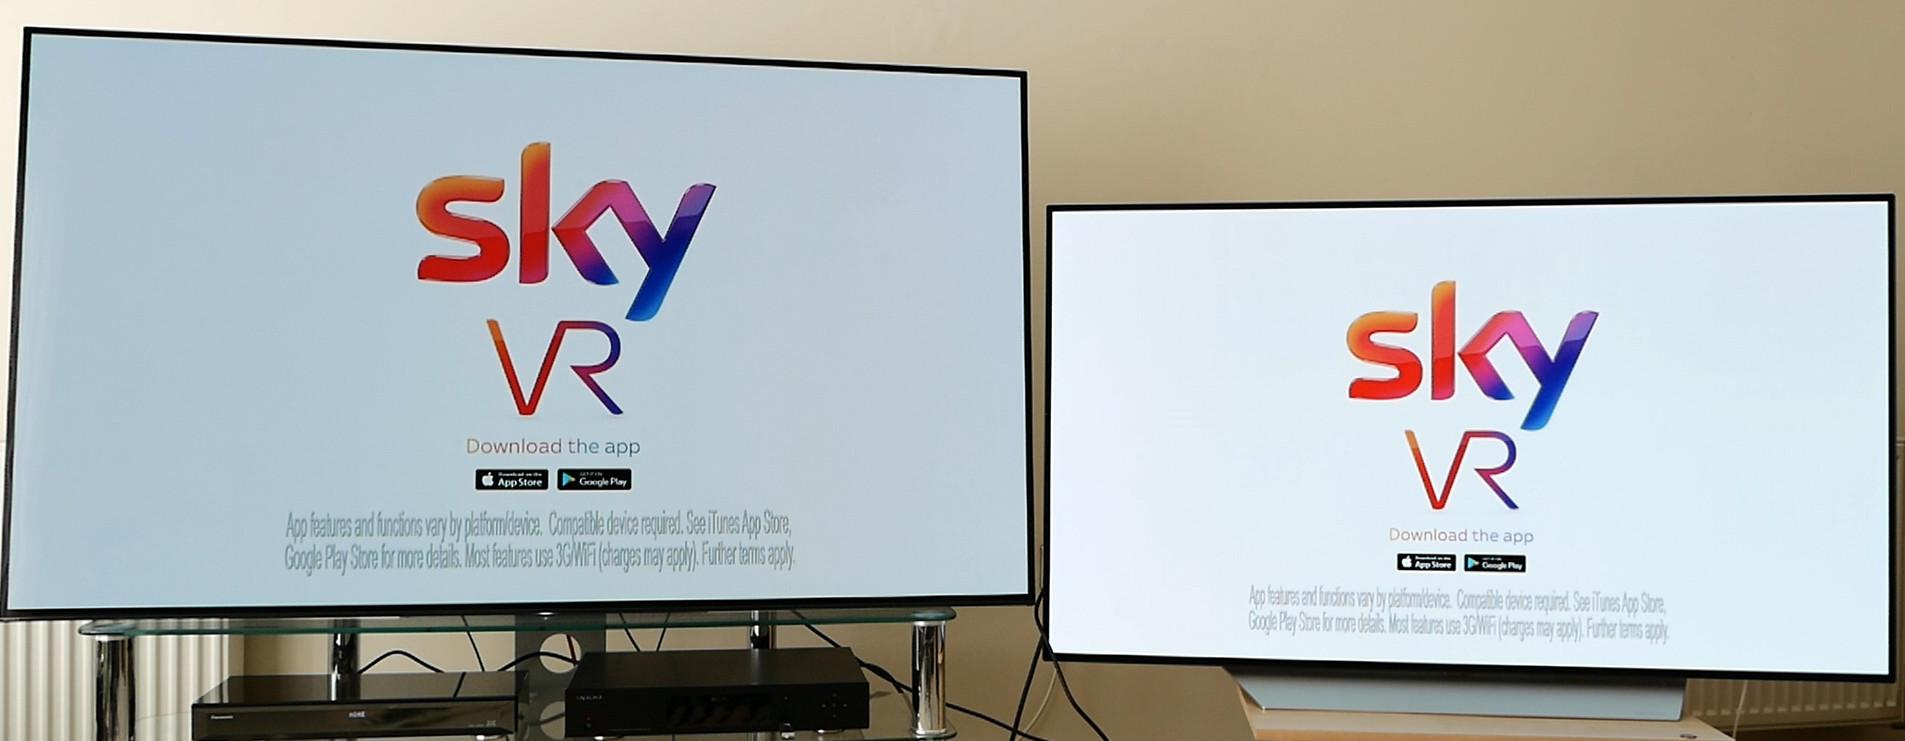 LG OLED55C7V (C7) OLED TV Review